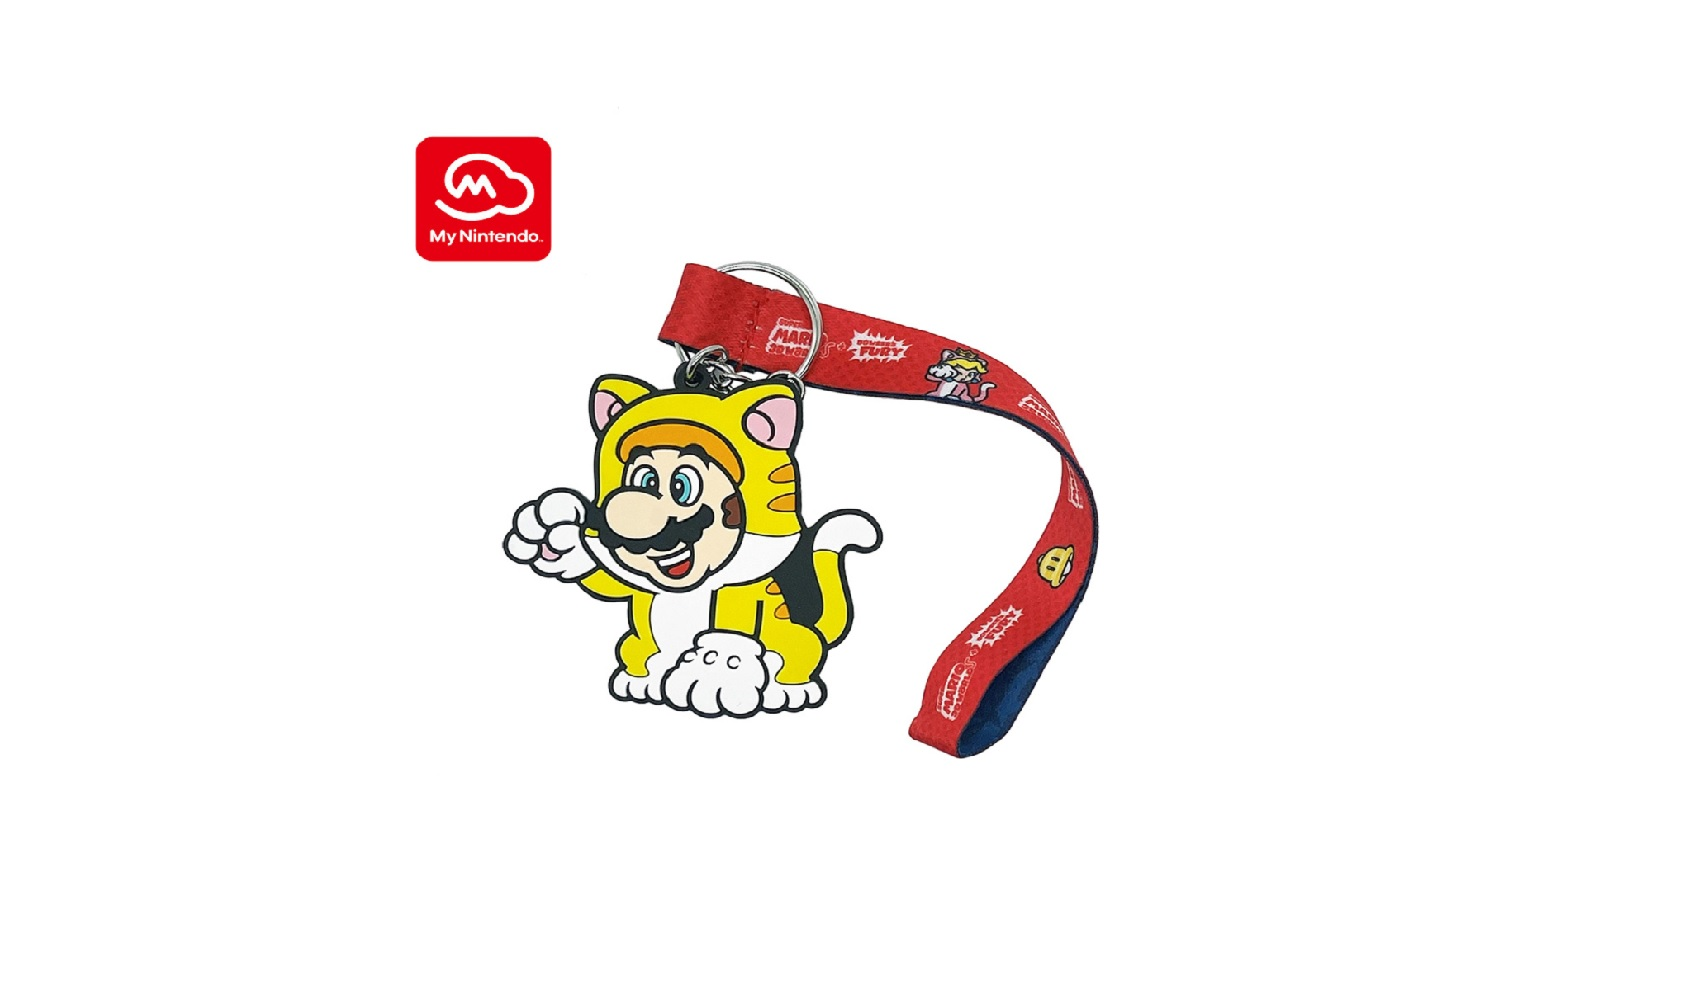 My Nintendo just got a new Cat Mario keychain along with a huge restock screenshot